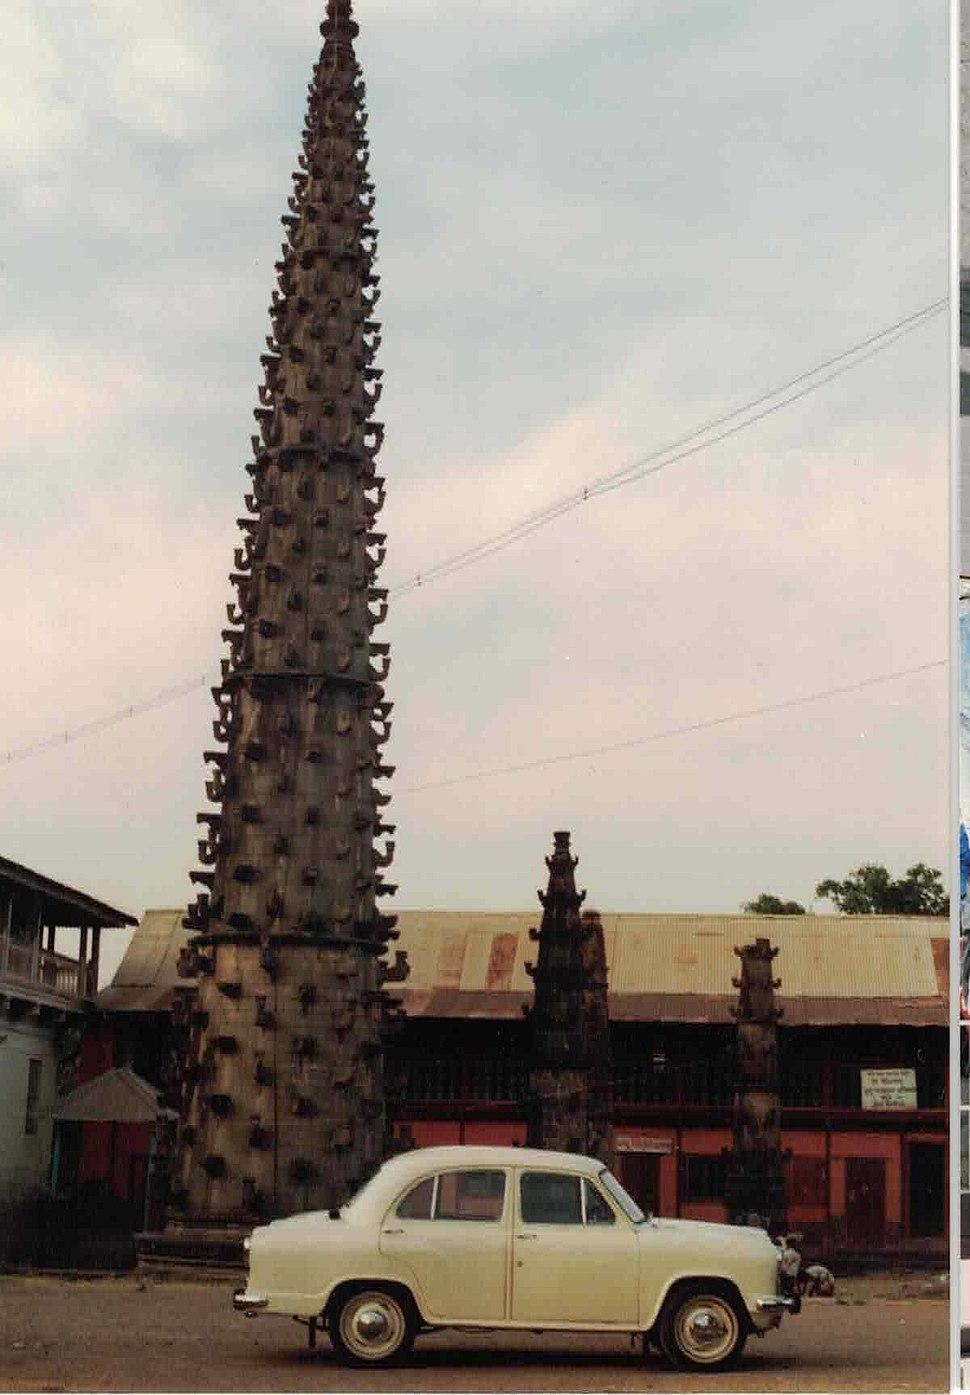 Deepmal at Yamai temple Aundh Satara India 15393016 10207854876154055 1249608055689690084 o